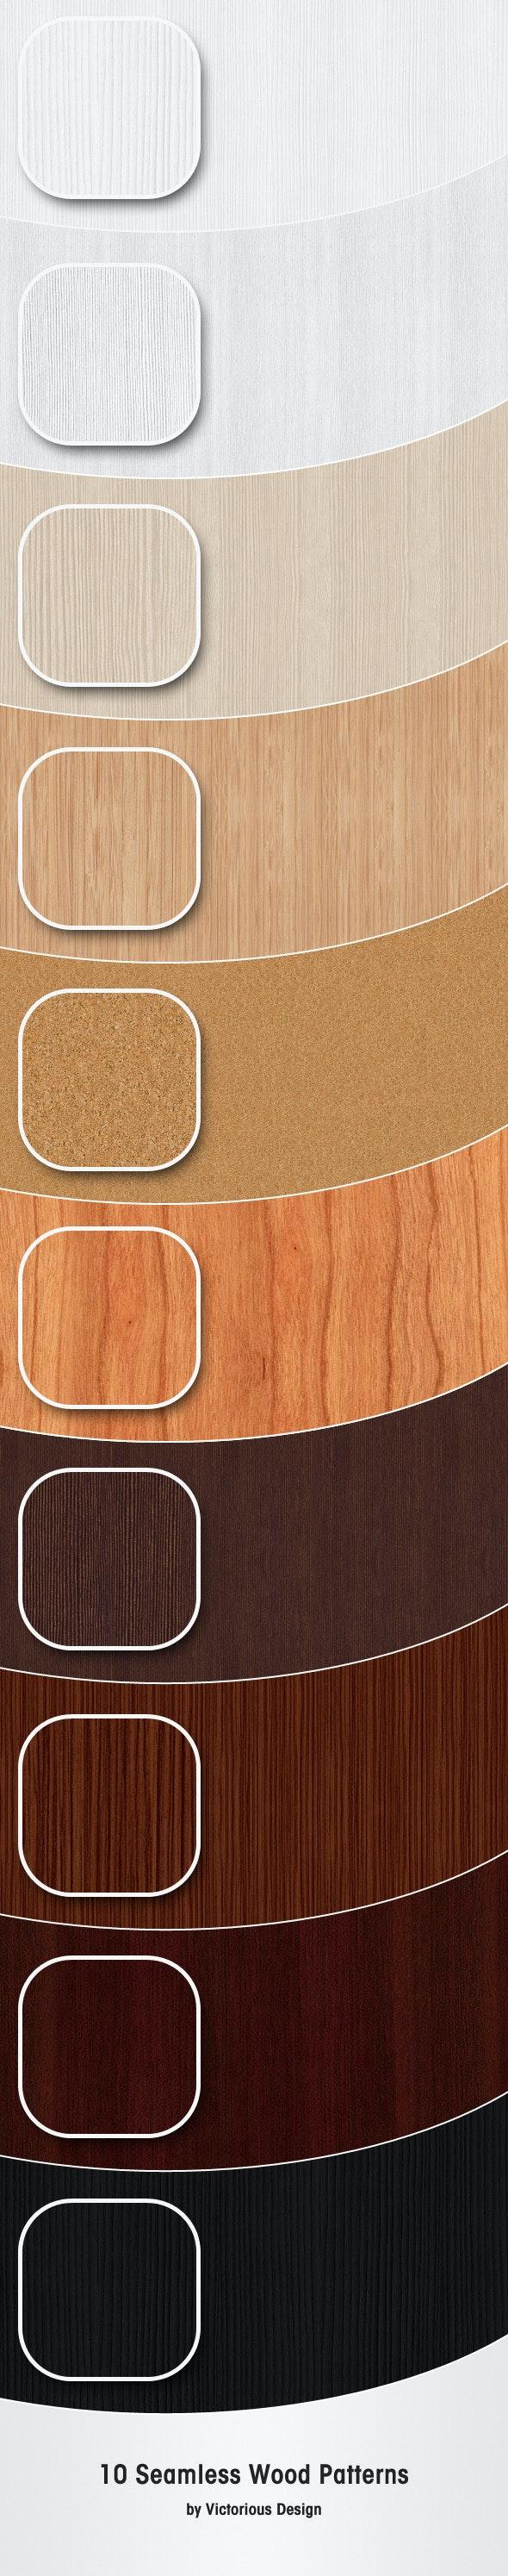 10 Seamless Wood Patterns - Textures / Fills / Patterns Photoshop